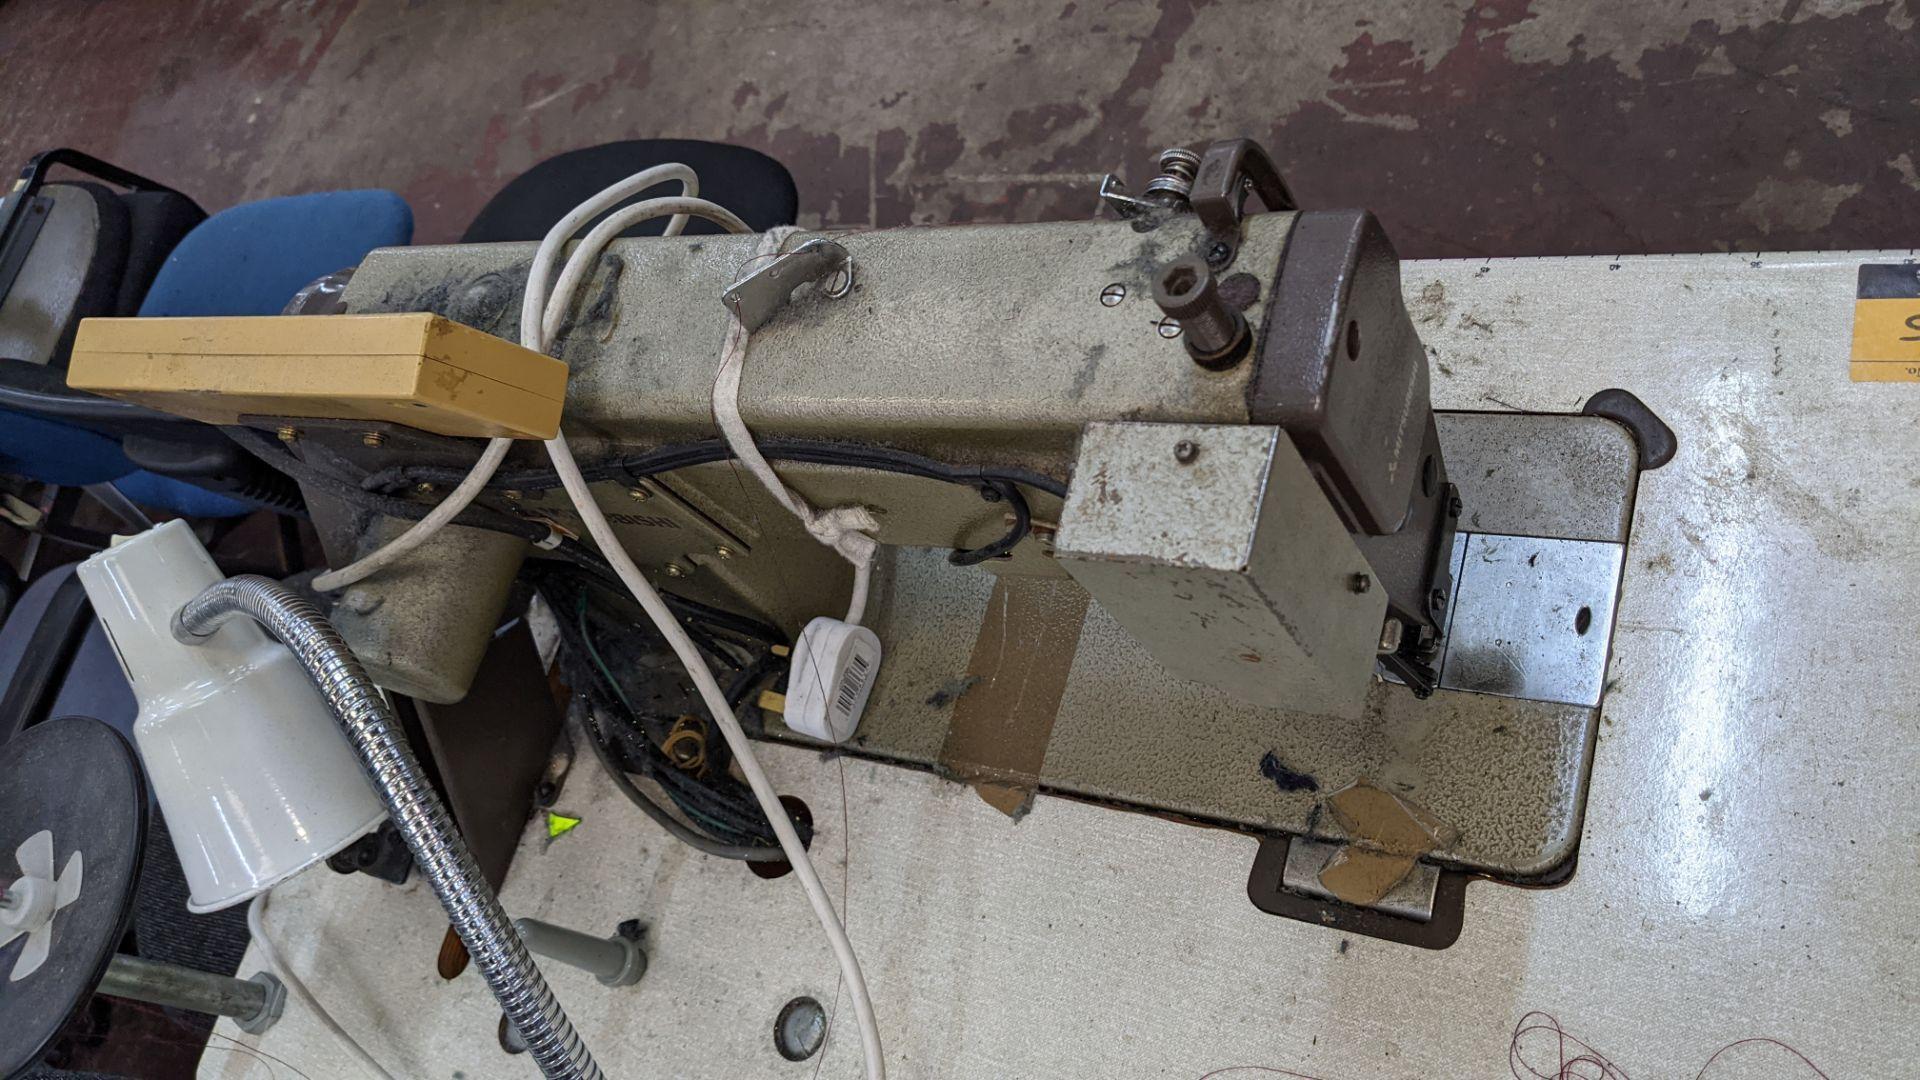 Mitsubishi LS2-180 sewing machine with Mitsubishi LF-C8 digital controller - Image 8 of 12